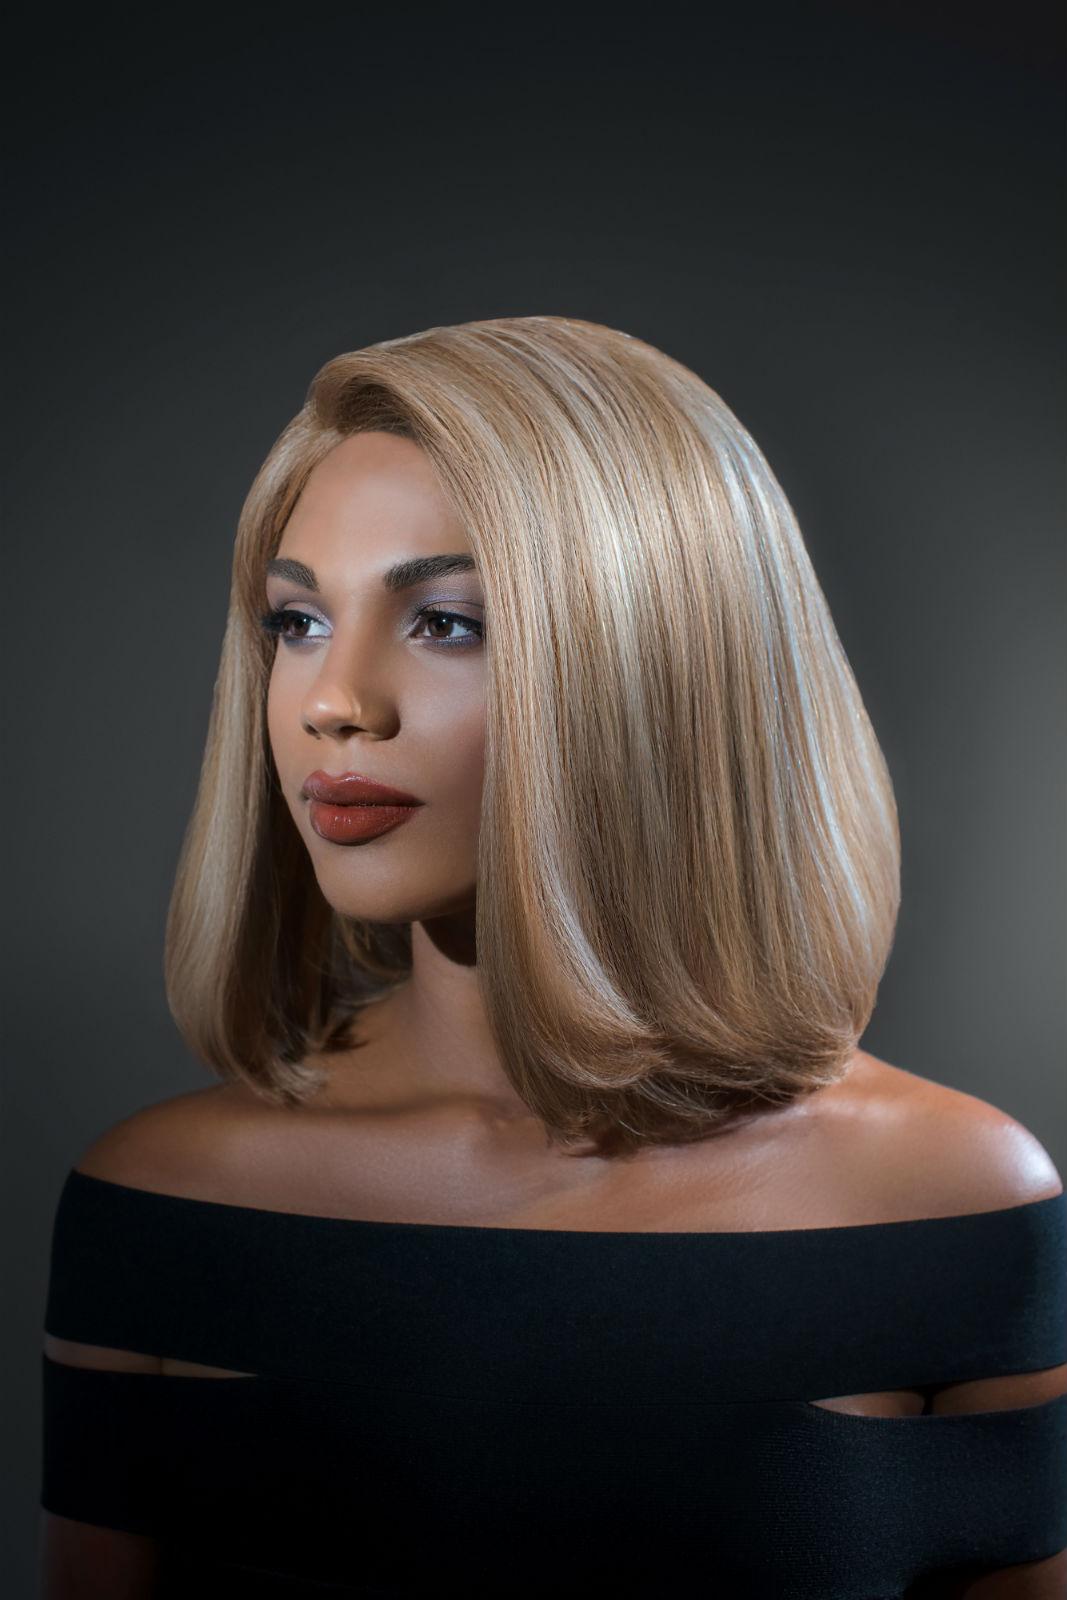 Luxury Human Hair Wig - Beige Blonde Bob Wig